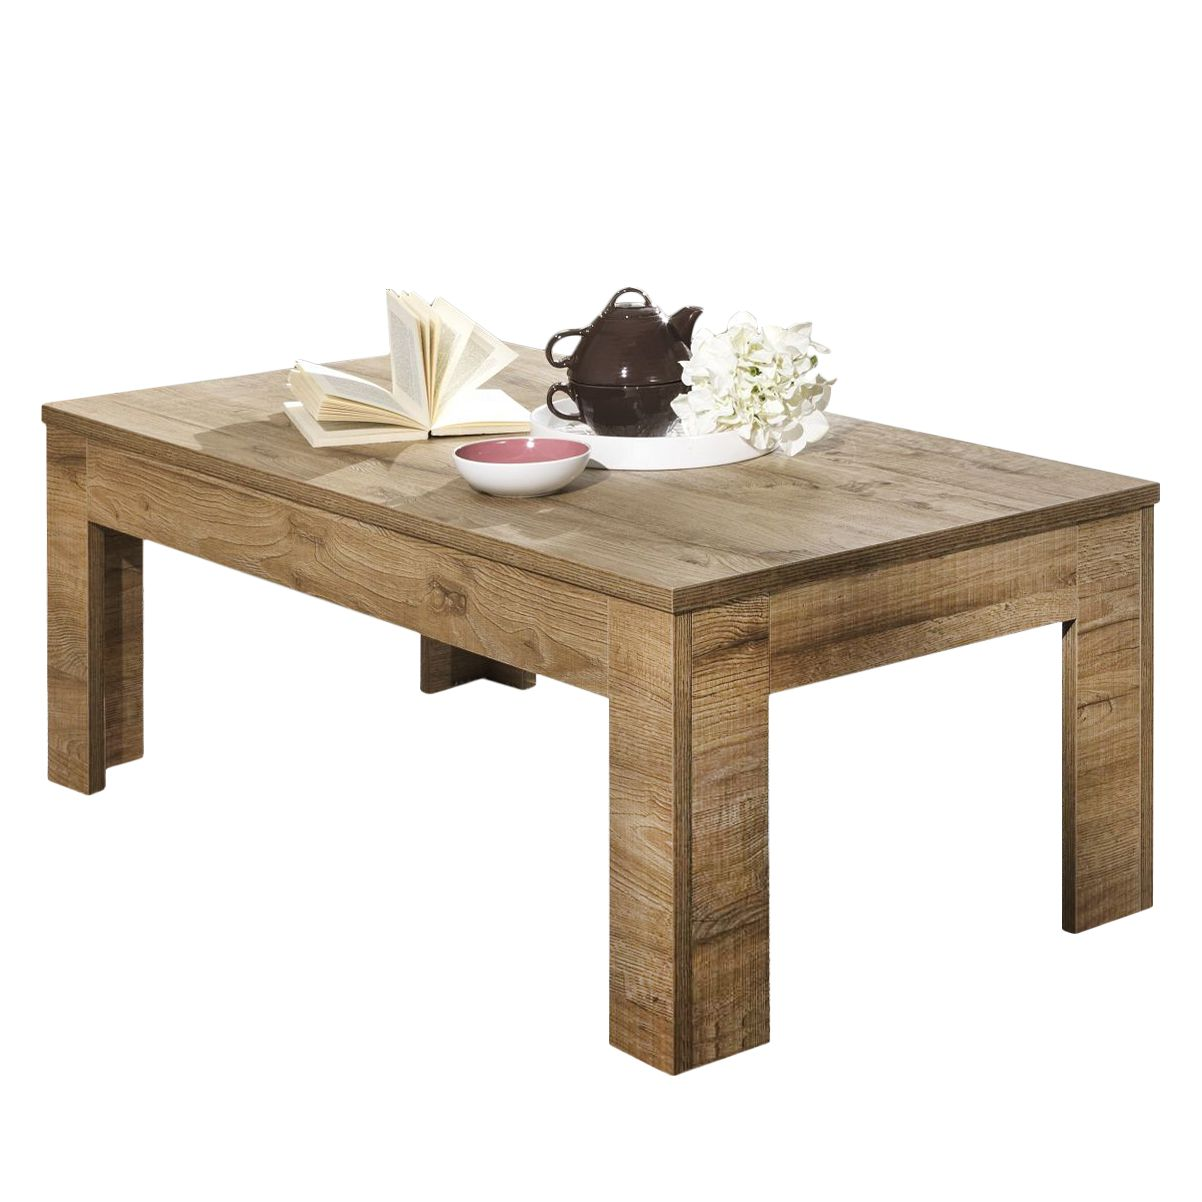 Tables Basses Basses Tables Tables Basses Design Tables Basses Design Pas Cher Tables Basses Design Italien Couchtisch Couchtisch 80x80